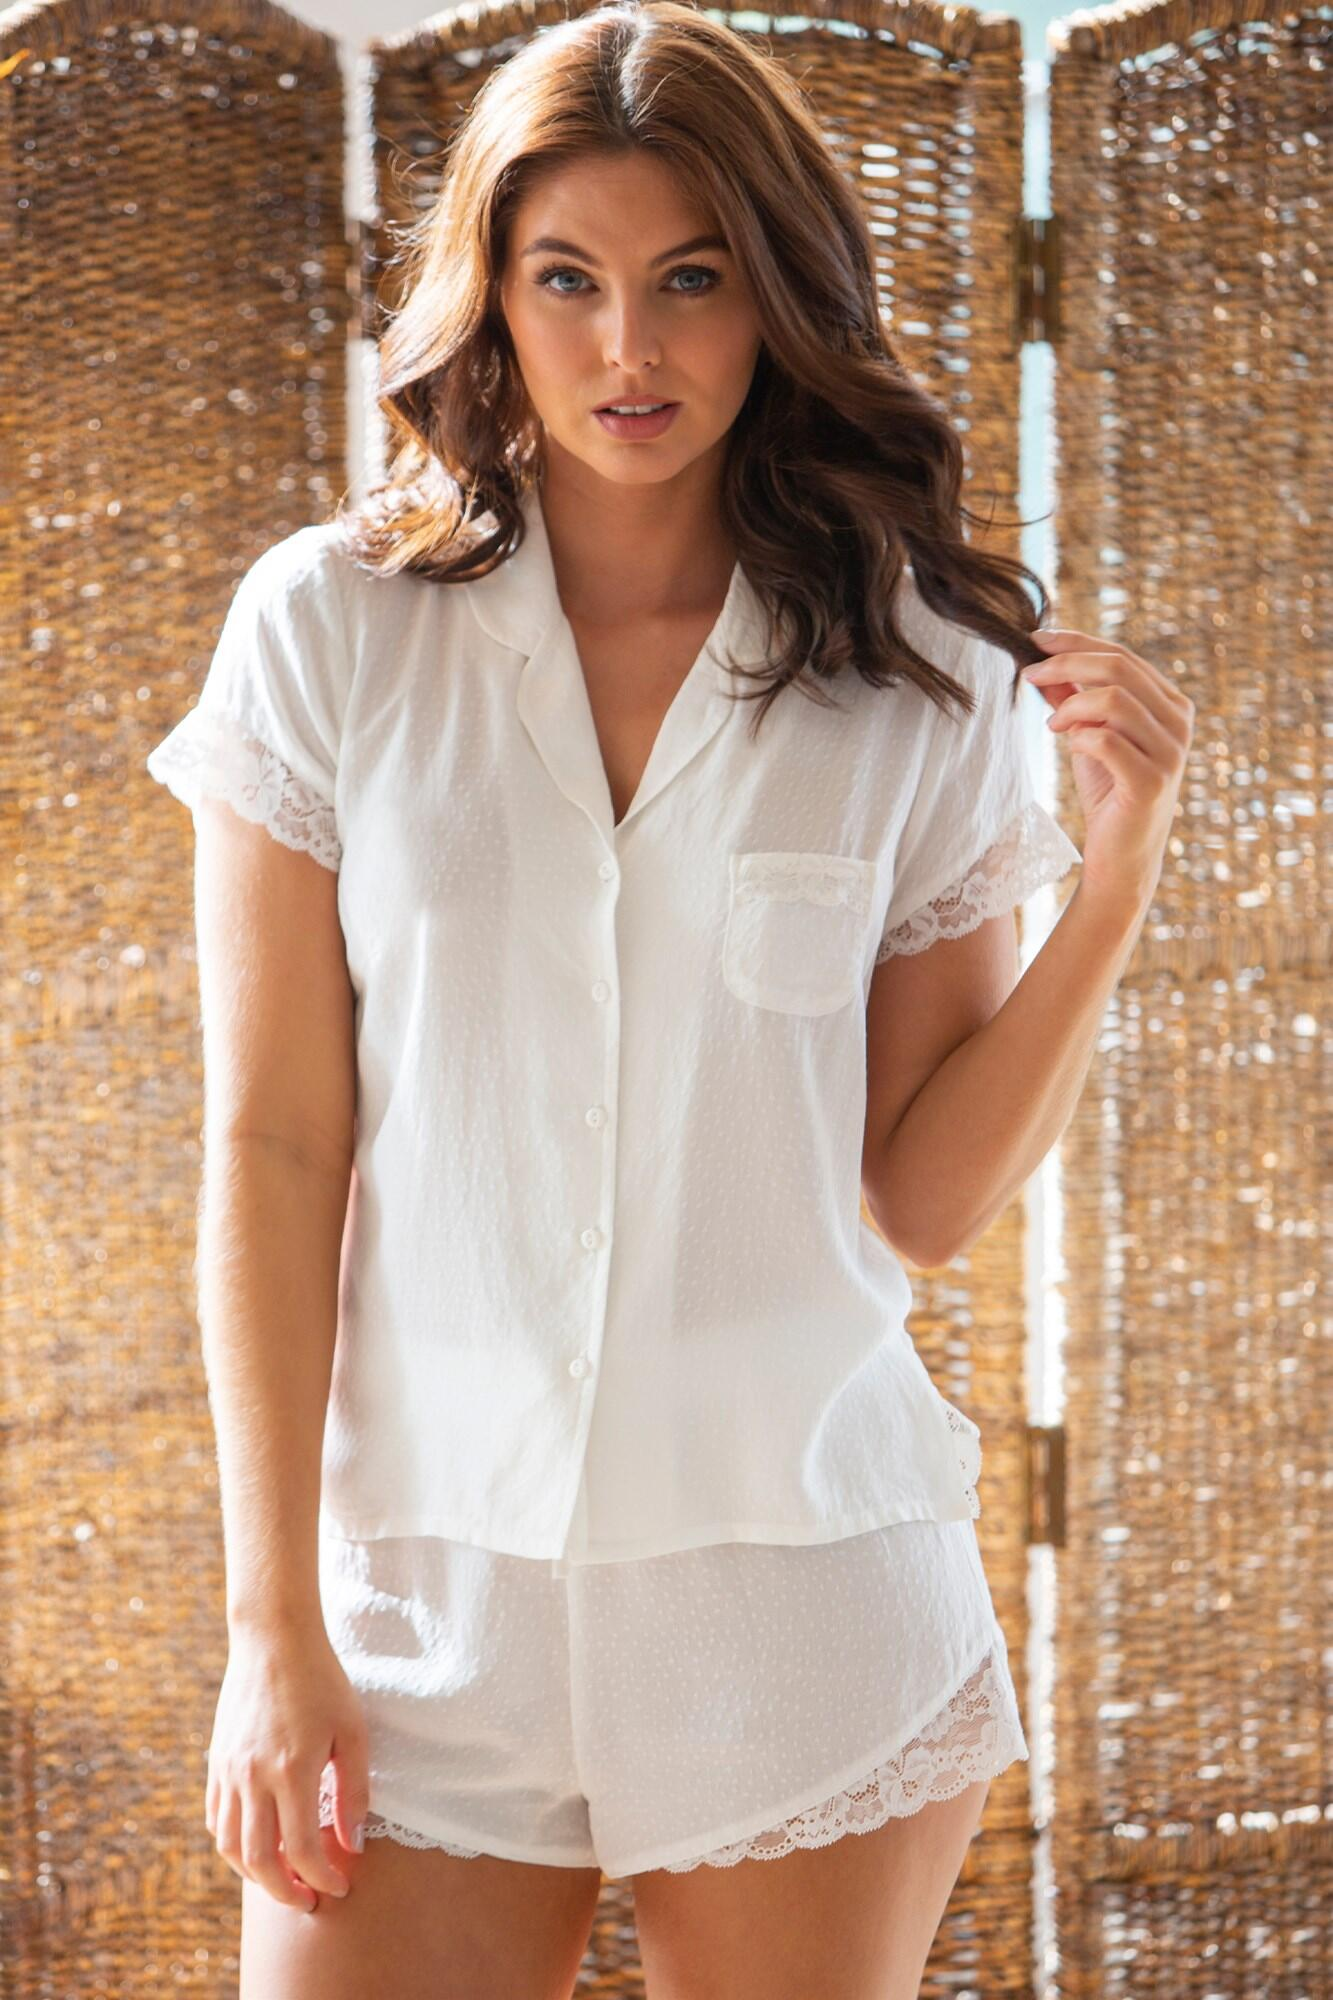 Spot Woven Lace Mix Revere Collar Shirt - White